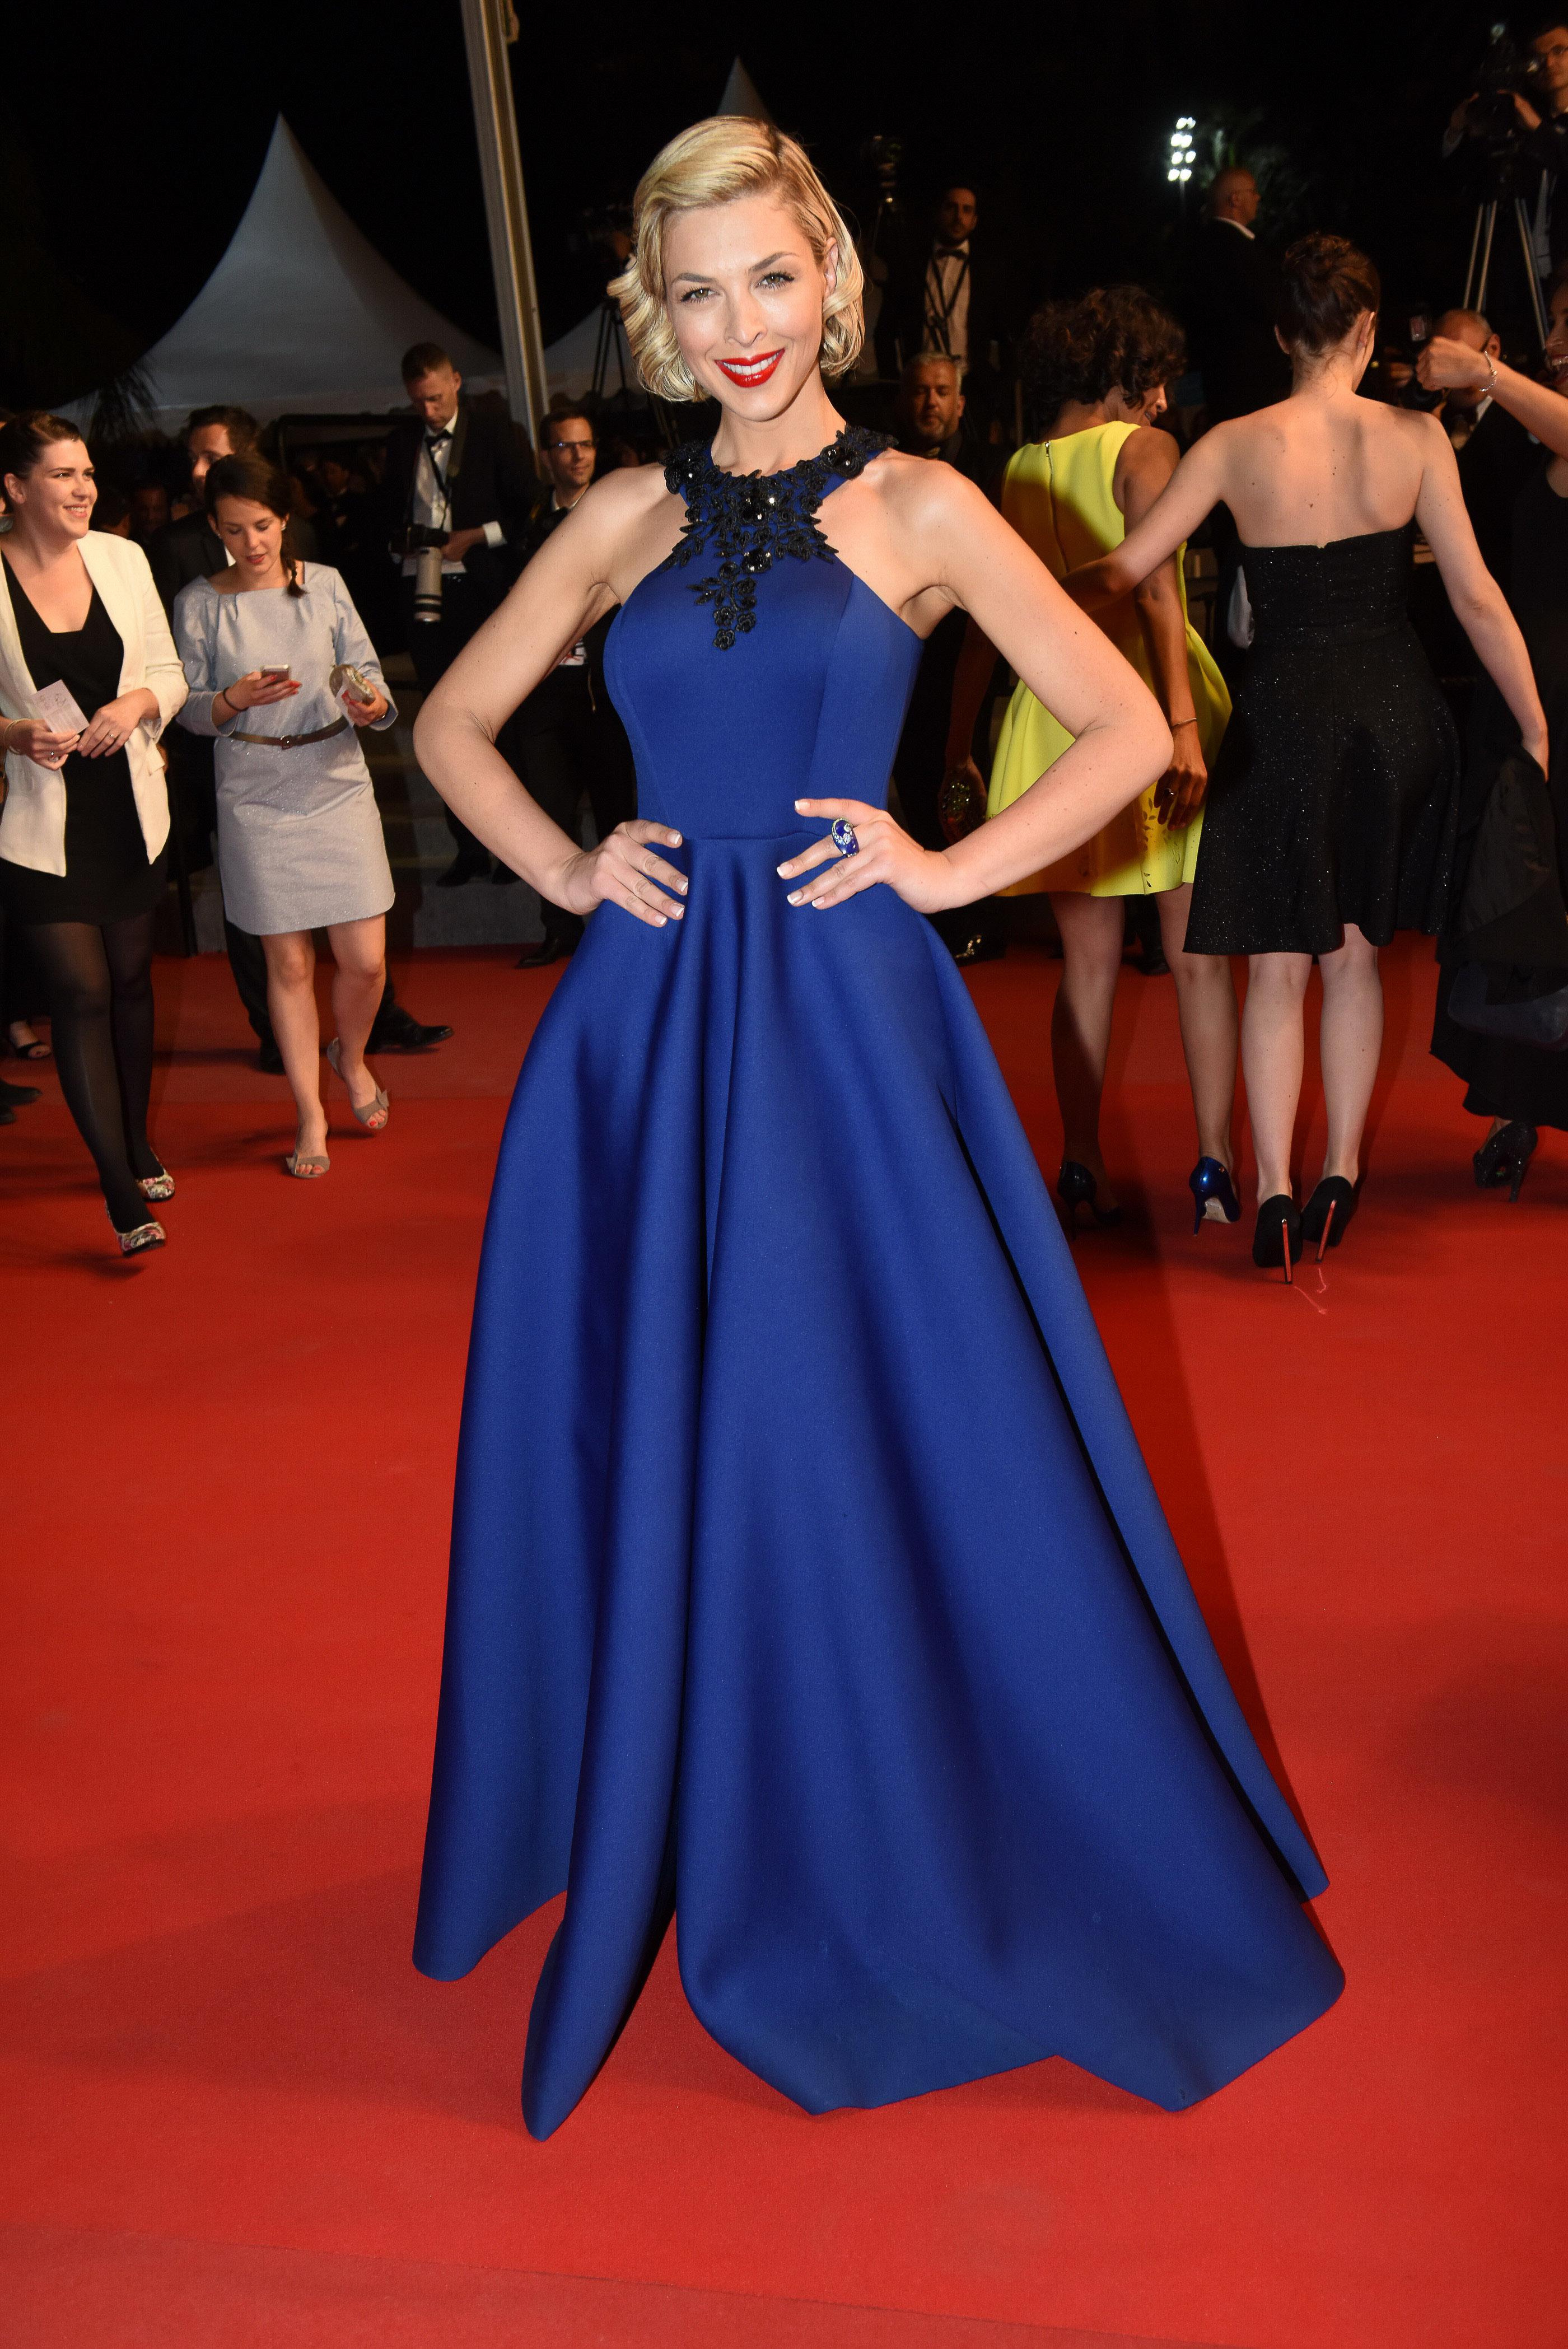 Eleonore Boccara. 2018-2019 celebrityes photos leaks! - 2019 year